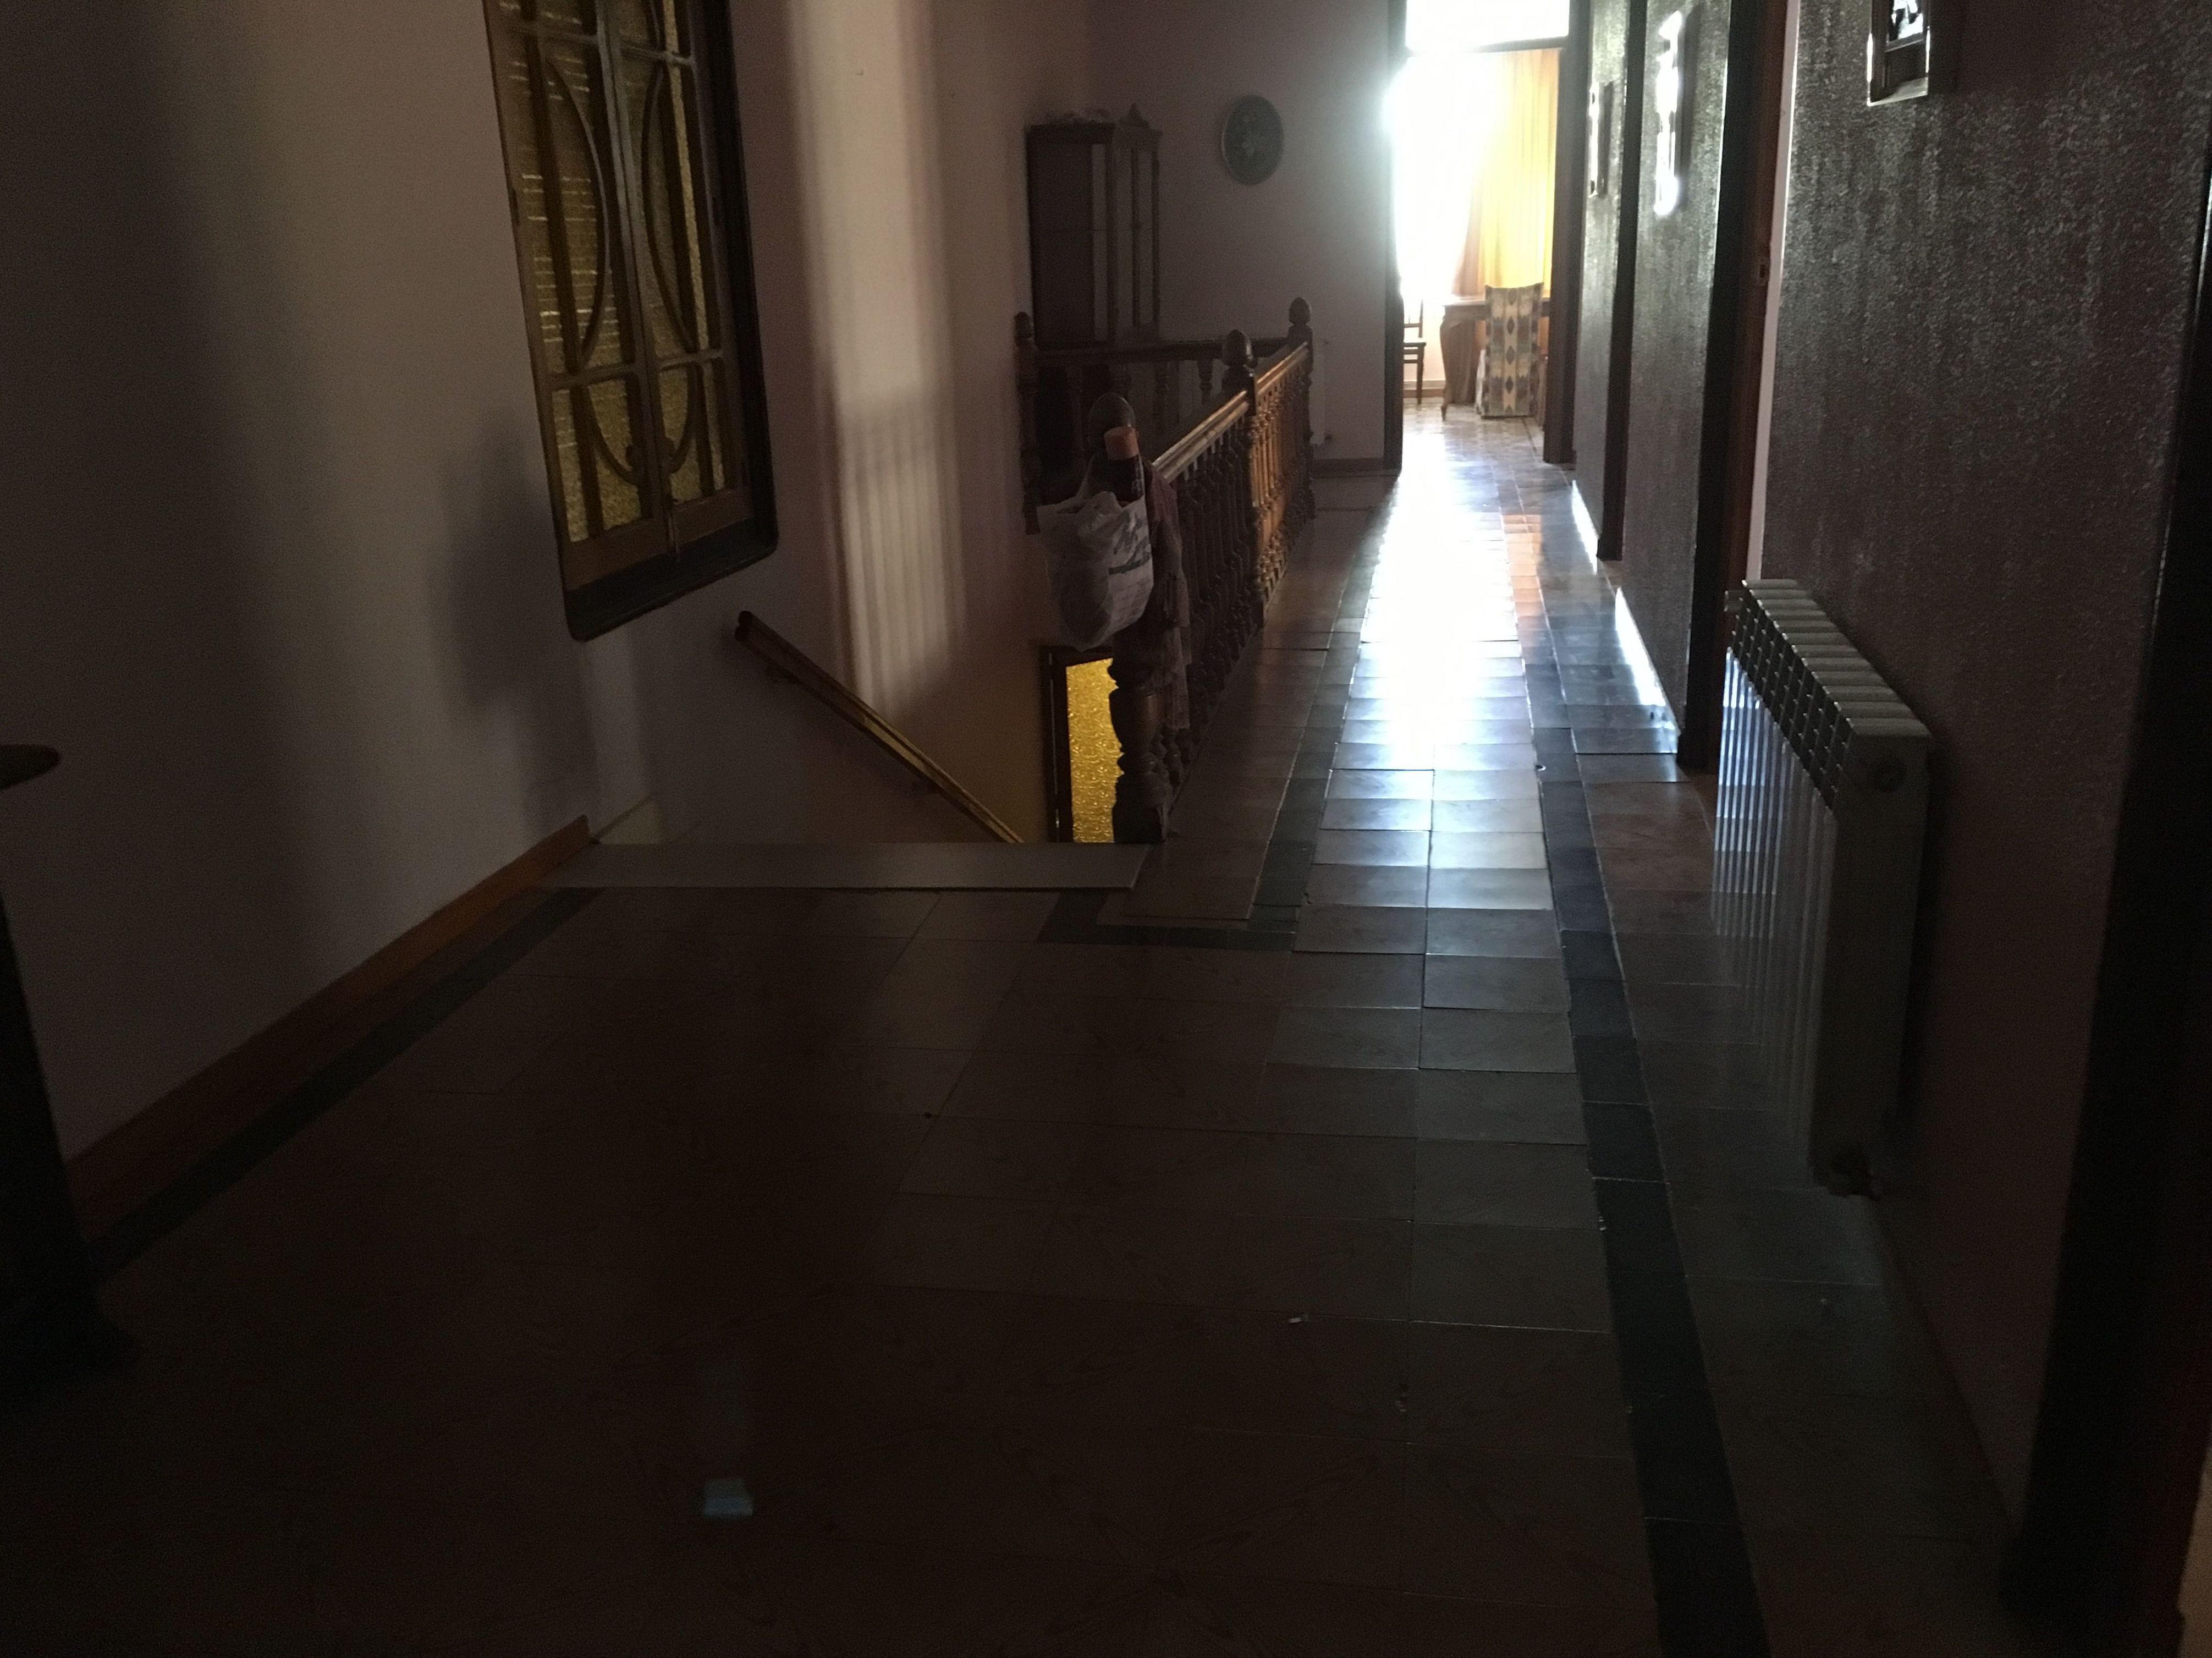 Piso casa en Carrasco Alcalde: Inmuebles Urbanos de ANTONIO ARAGONÉS DÍAZ PAVÓN